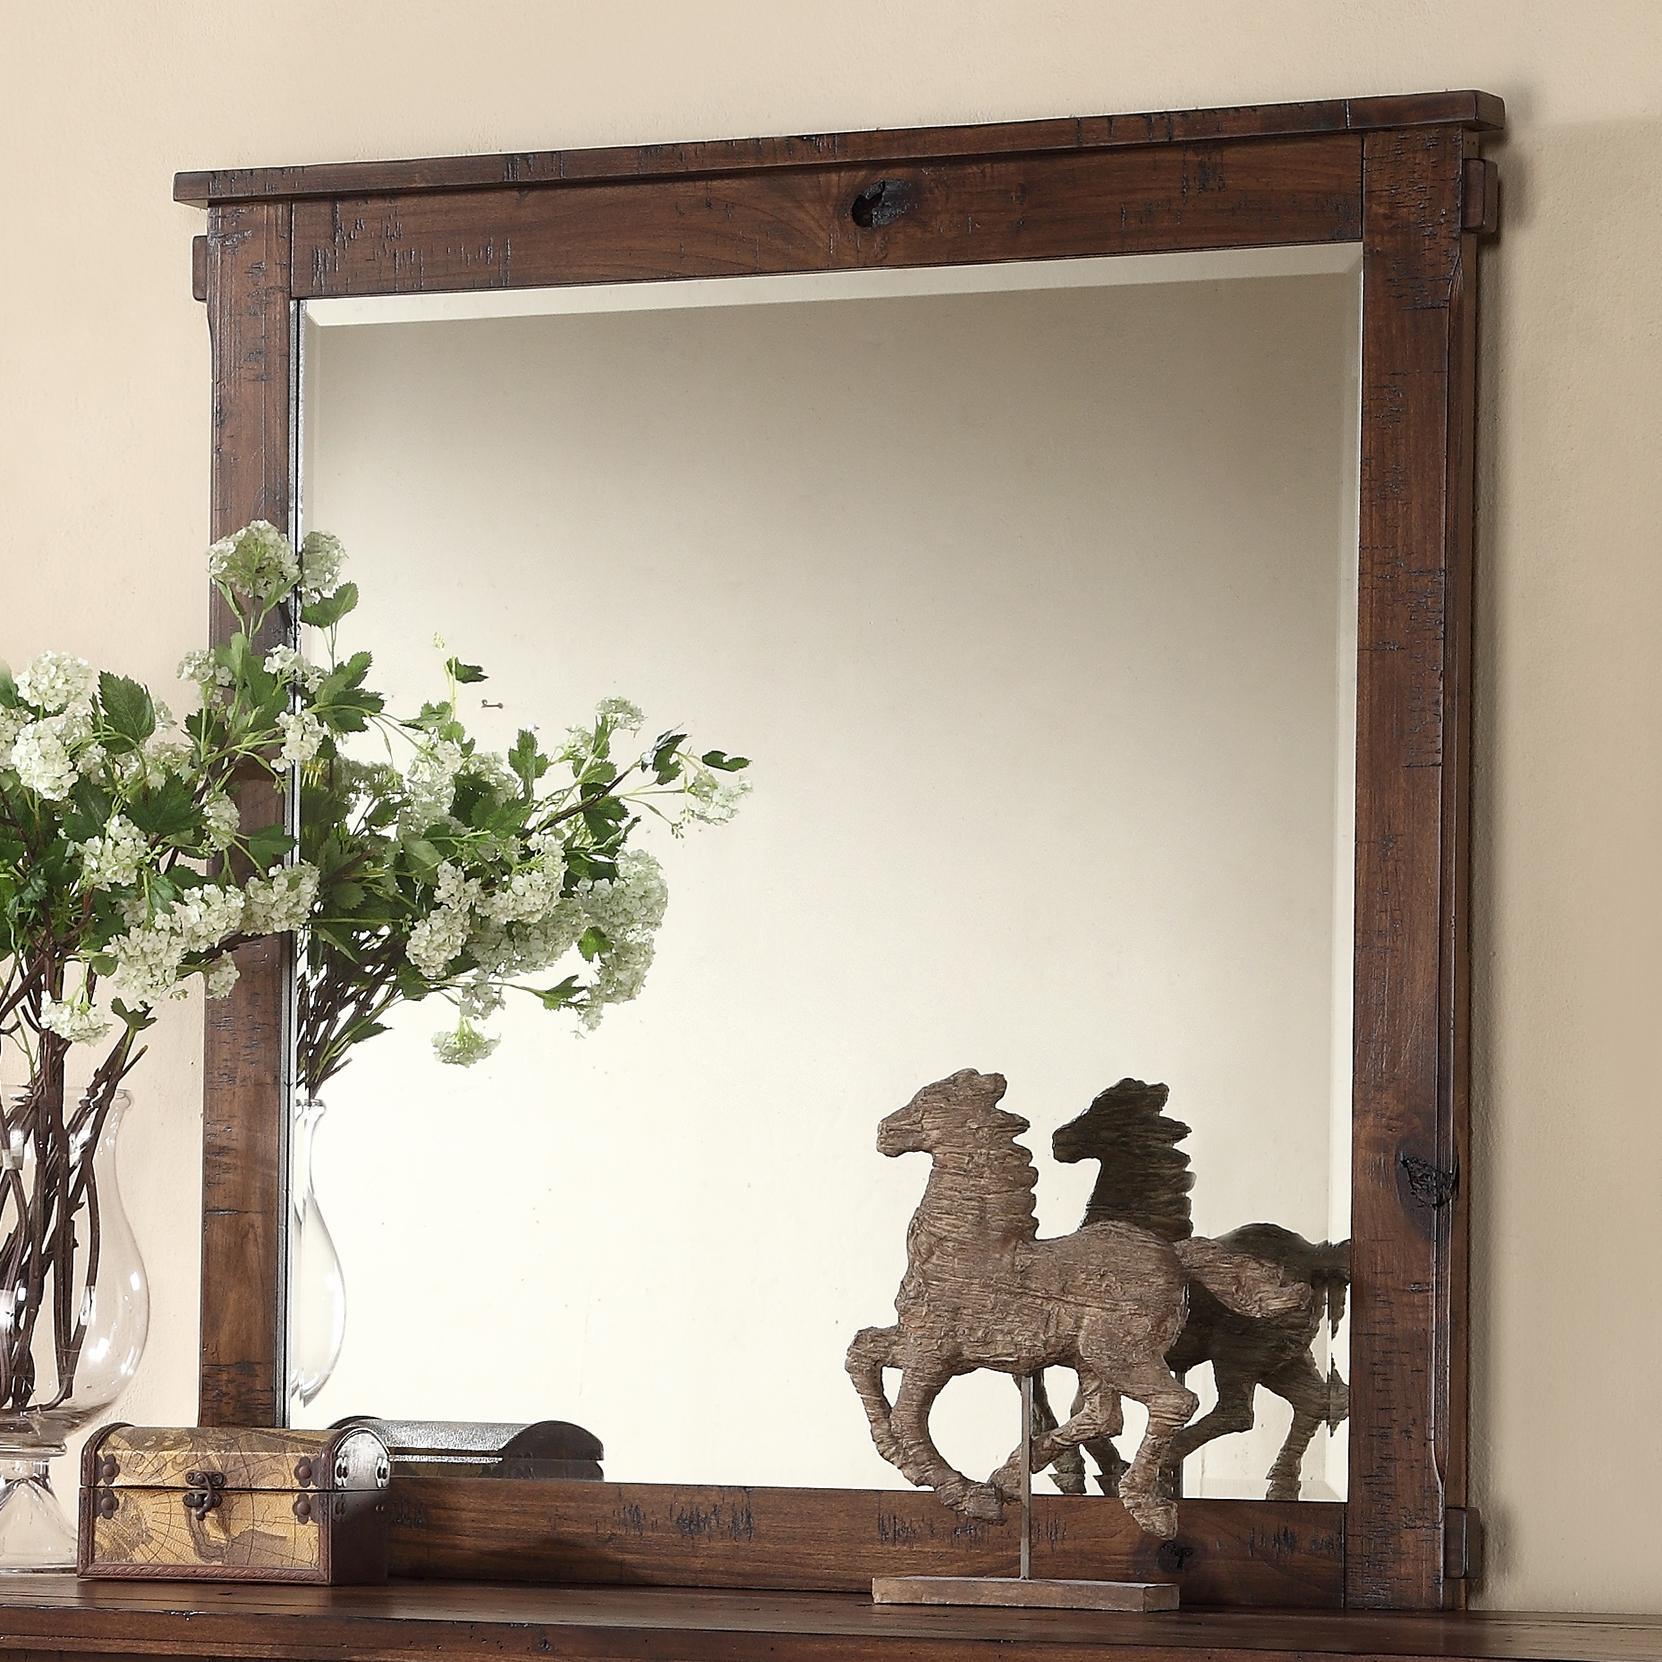 Legends Furniture Restoration Restoration Mirror - Item Number: ZRST-7014